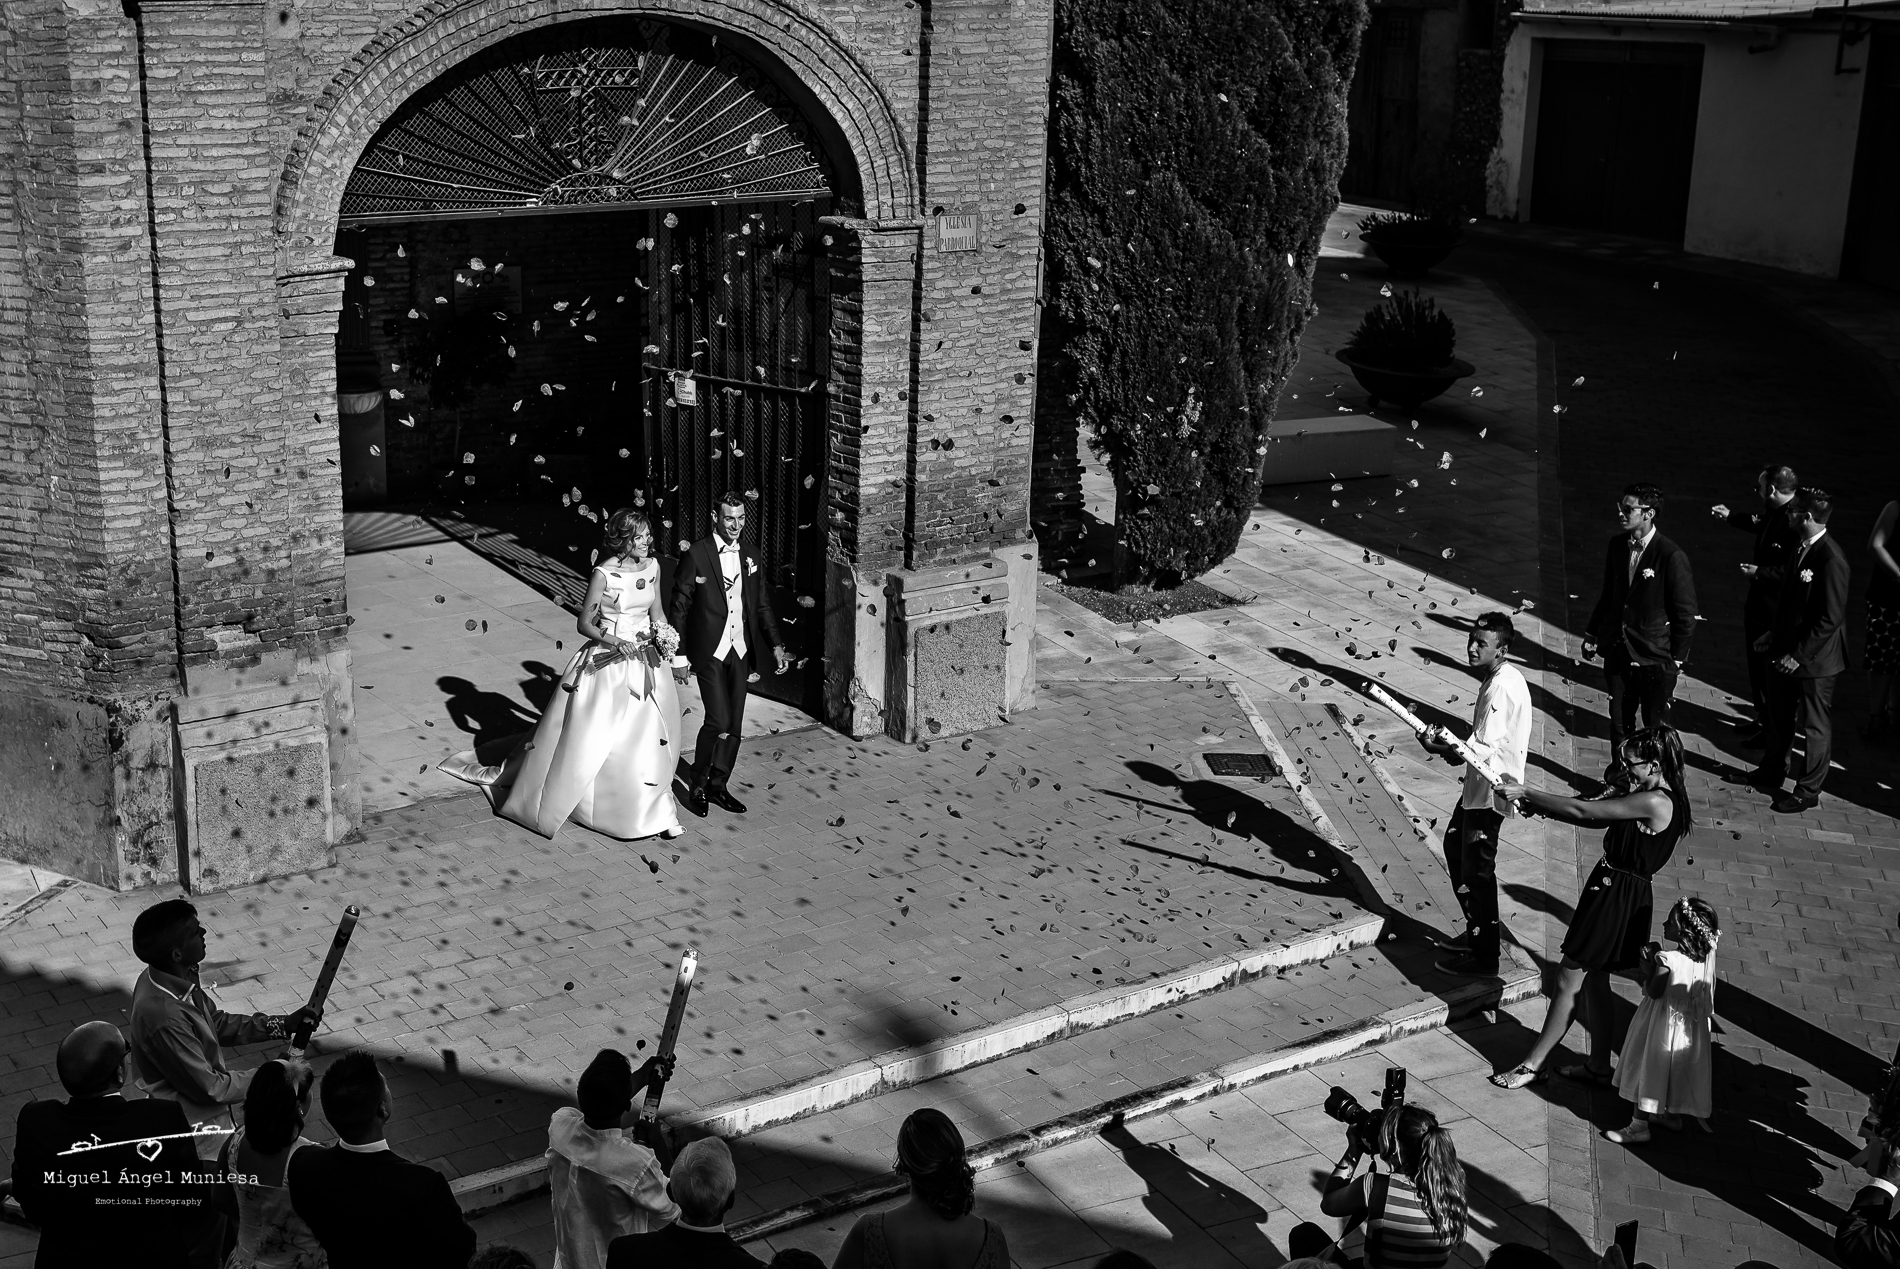 boda, fotografia de boda, boda zaragoza, fotografia, wedding, wedding photography, miguel angel muniesa, fotografo boda Zaragoza, fotografo boda, destination wedding_ 030